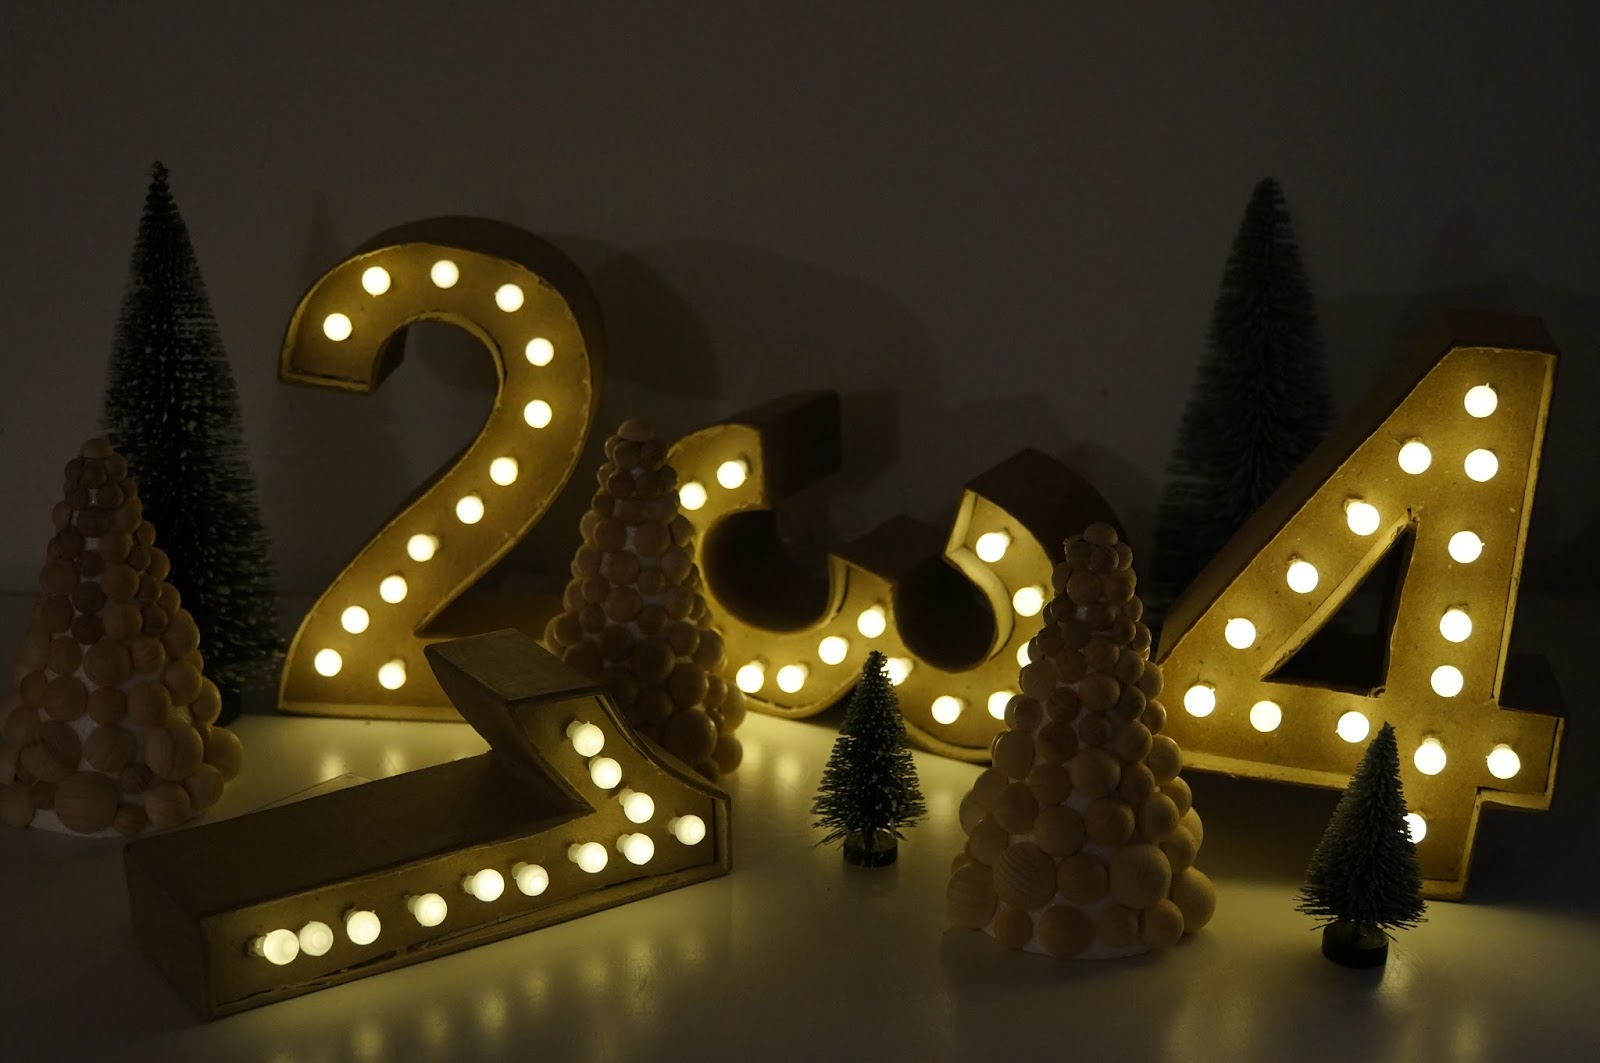 Basteln Malen Kuchen Backen Advent Advent Antvenskalender